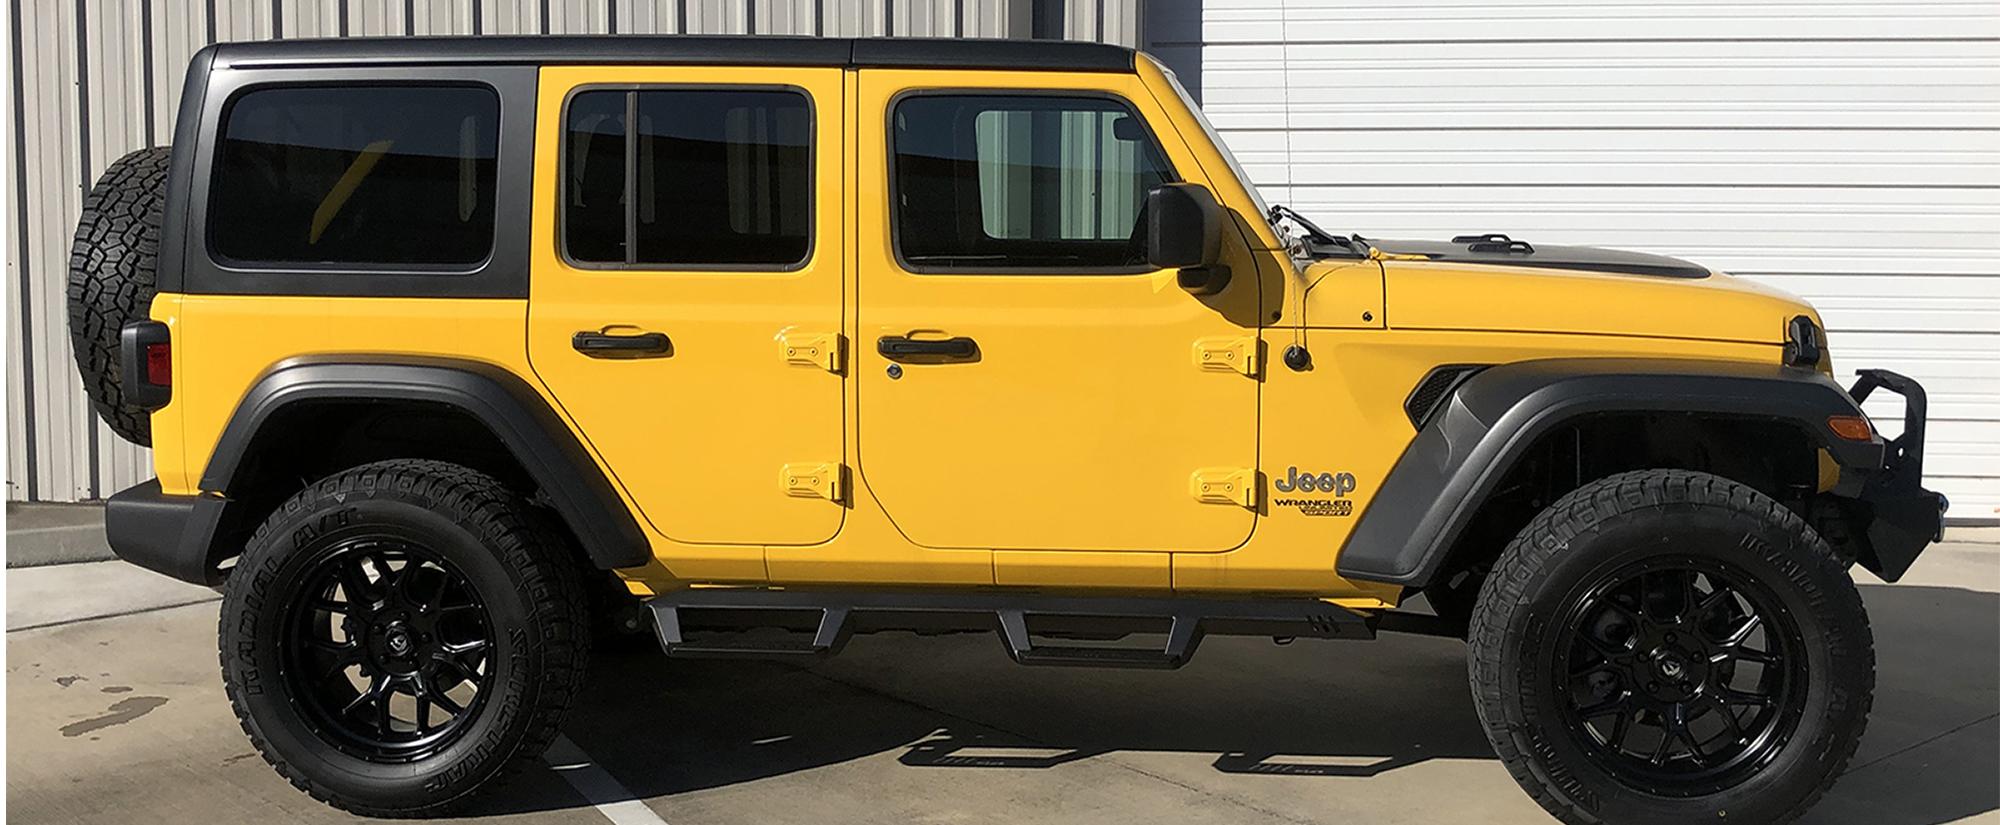 2020 Yellow Jeep Wrangler JL Hero